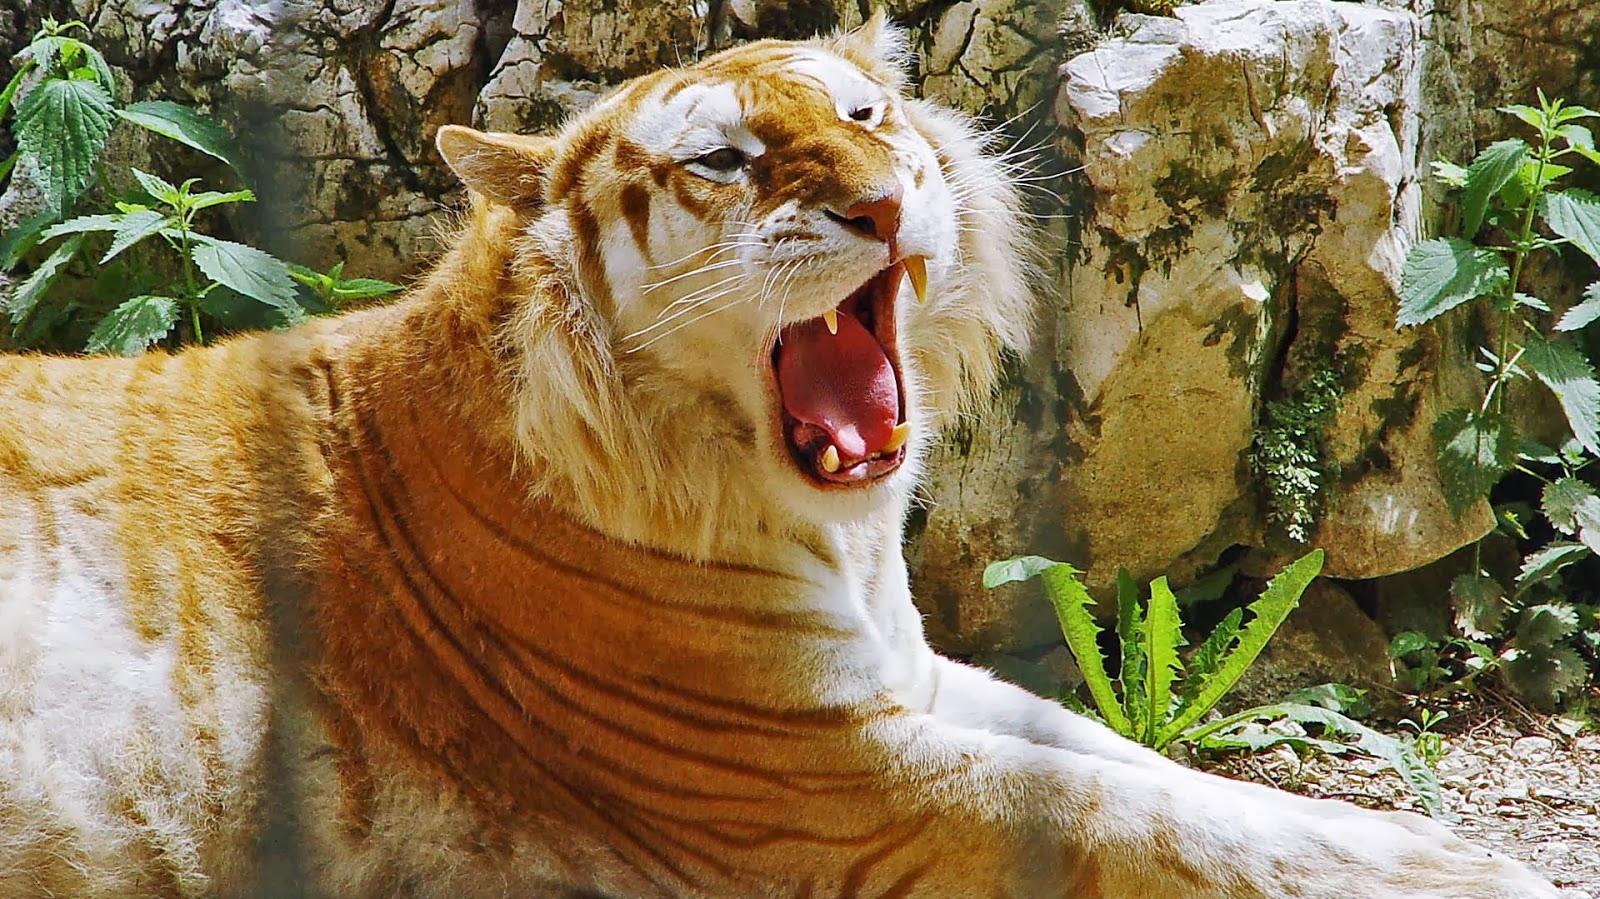 Swift Zulian Tiger  Item  World of Warcraft  wowheadcom